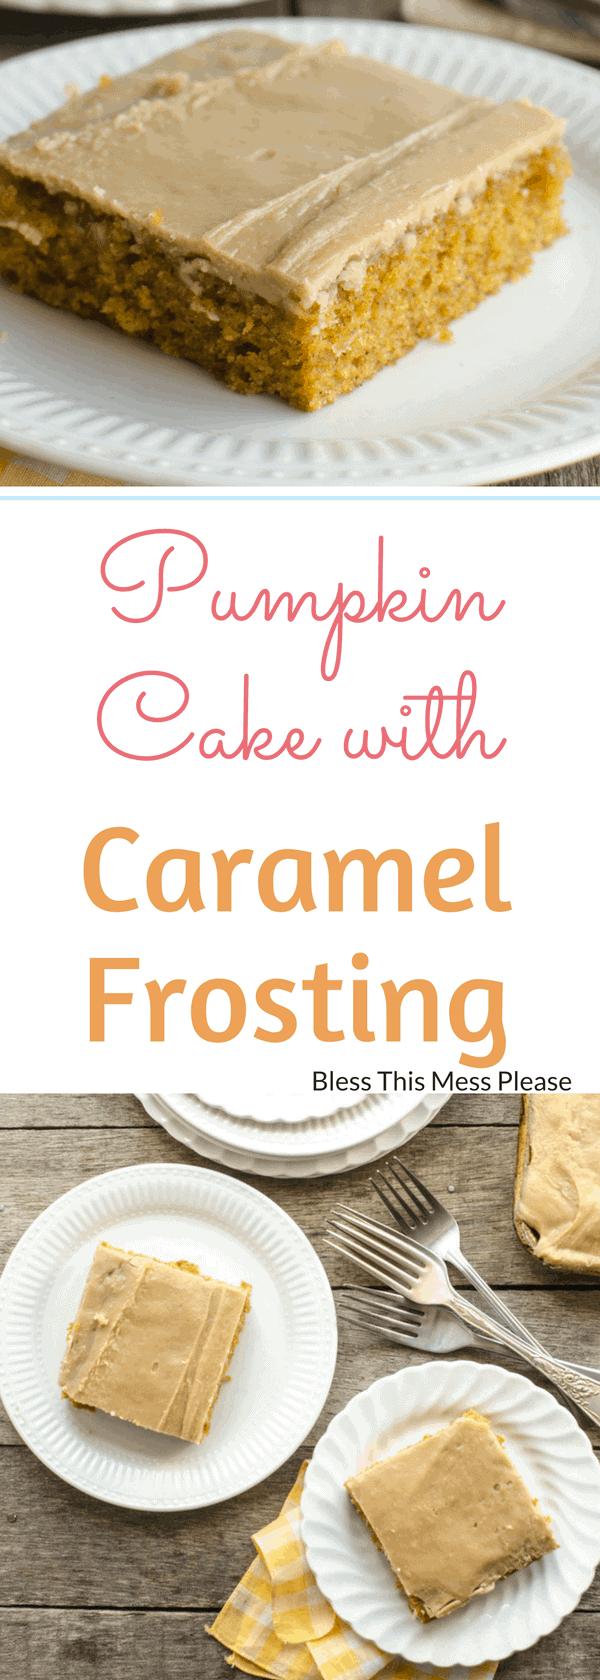 Pumpkin Sheet Cake with Caramel Frosting